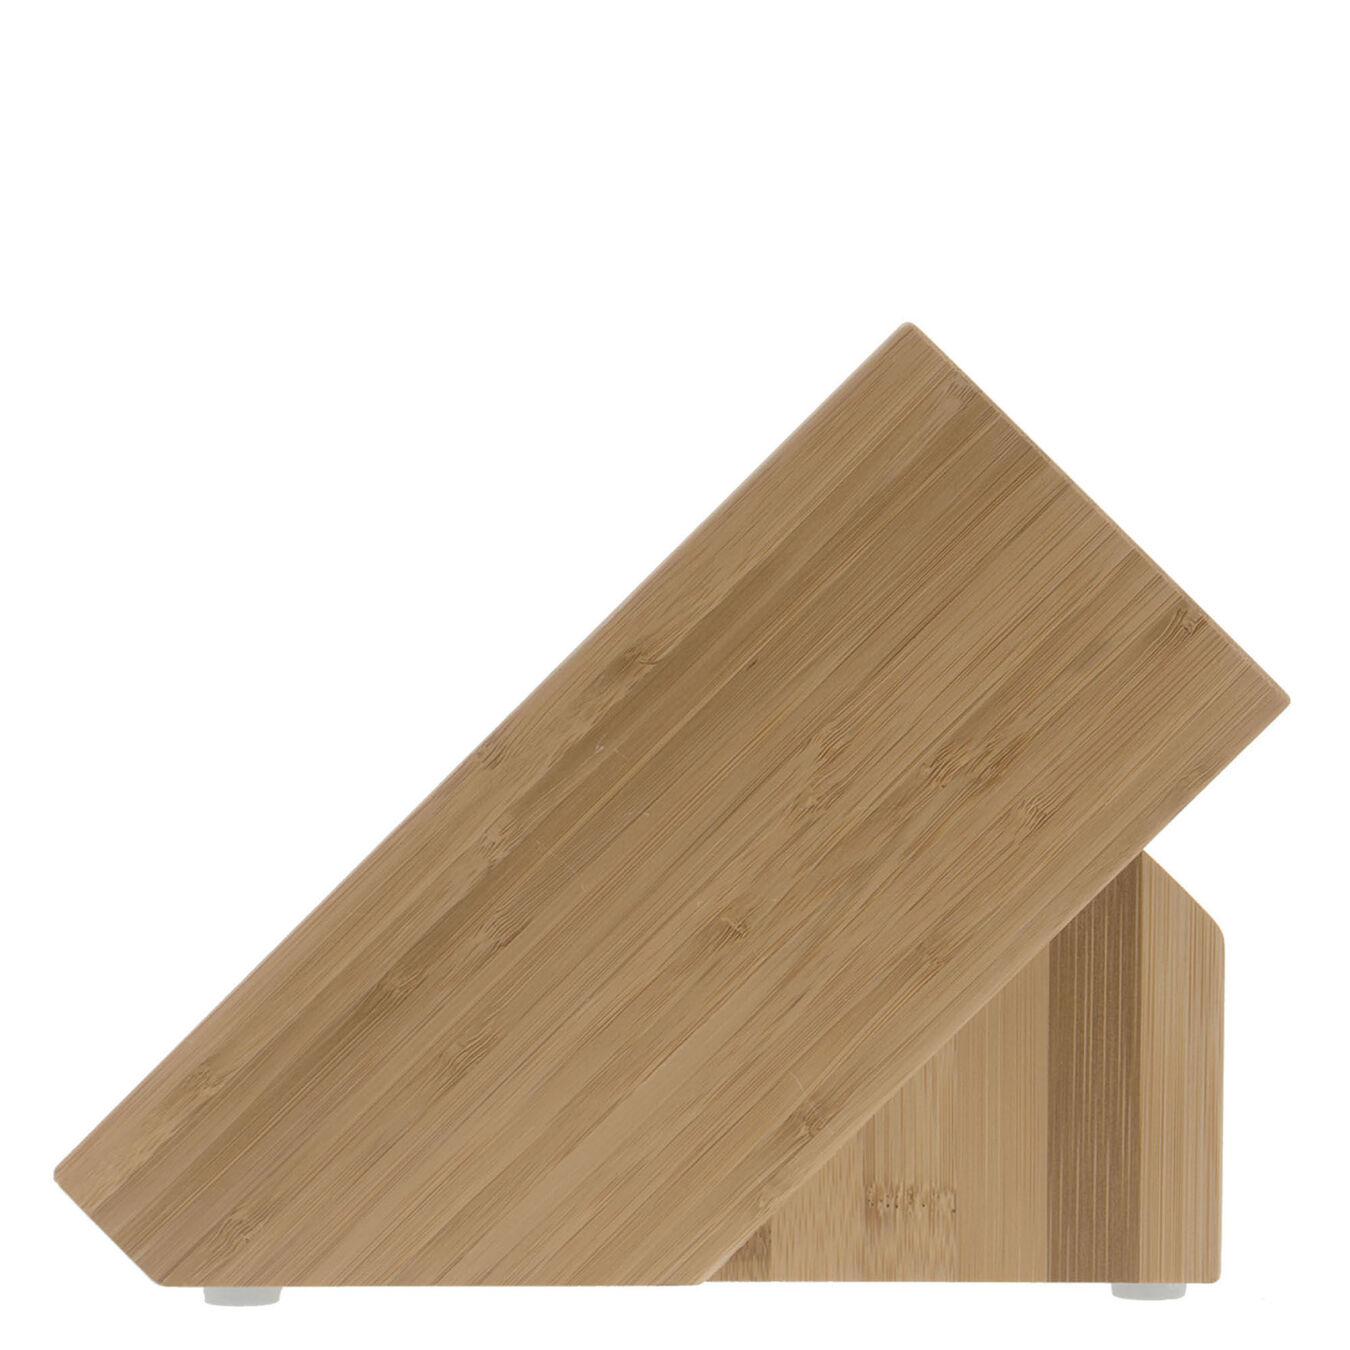 Bamboo 16-slot block,,large 5